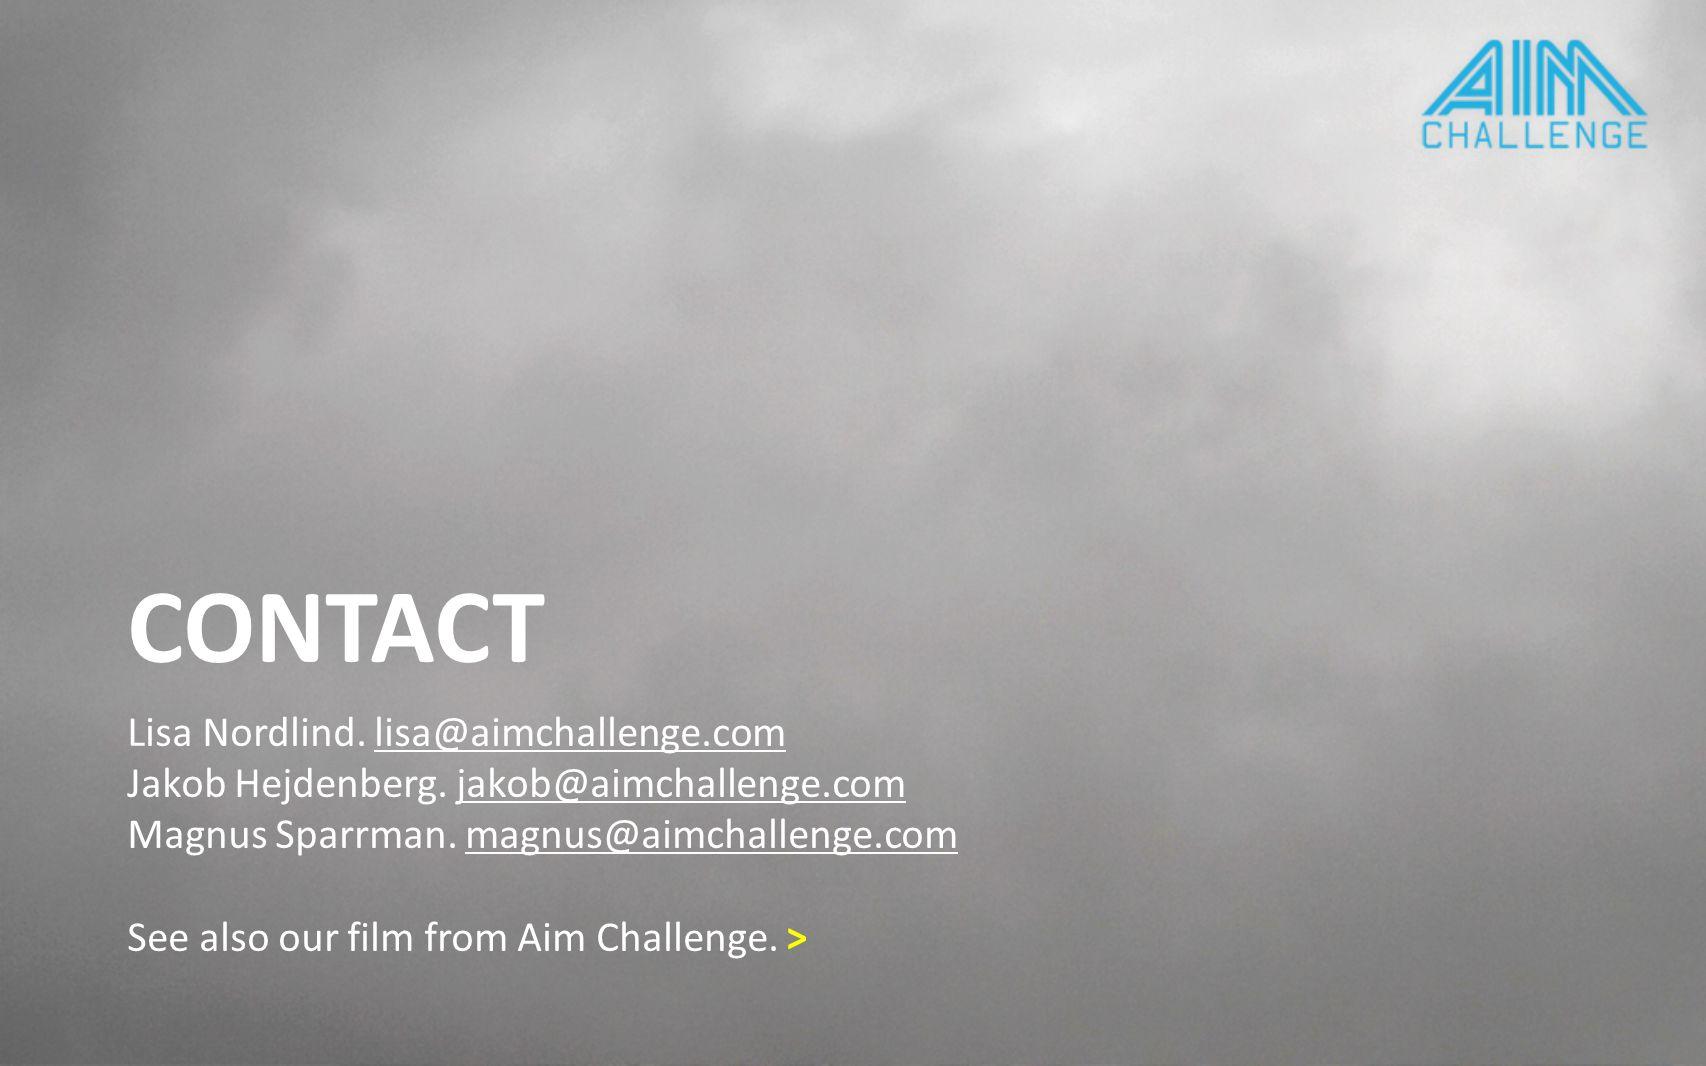 CONTACT Lisa Nordlind. lisa@aimchallenge.comlisa@aimchallenge.com Jakob Hejdenberg.